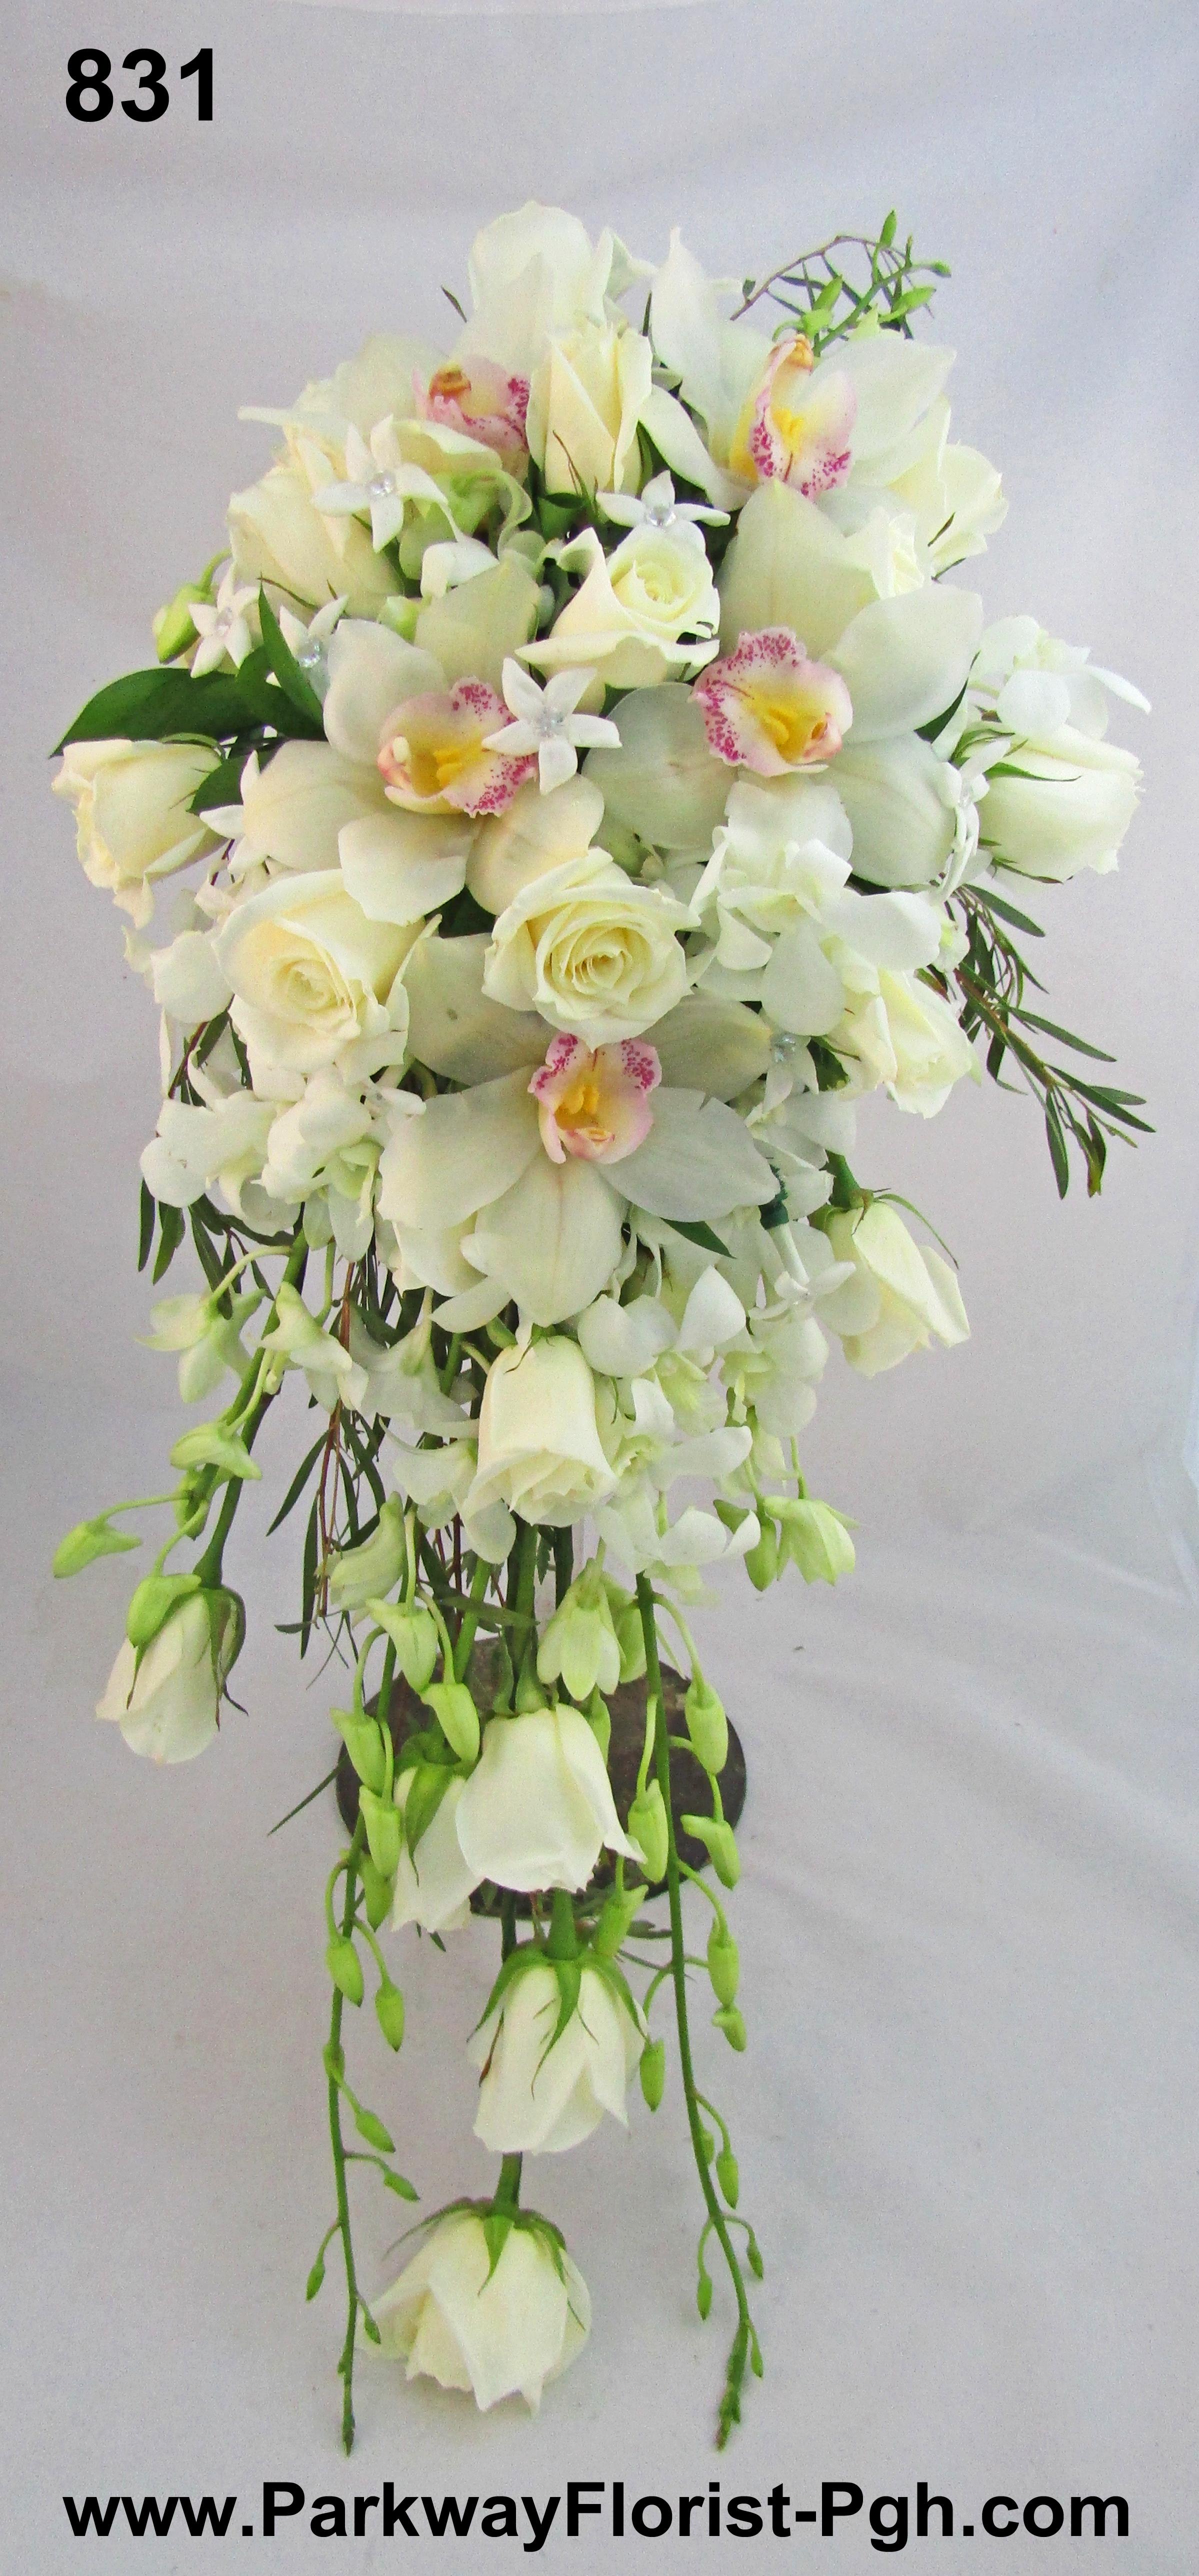 bouquets | Parkway Florist Pittsburgh Blog